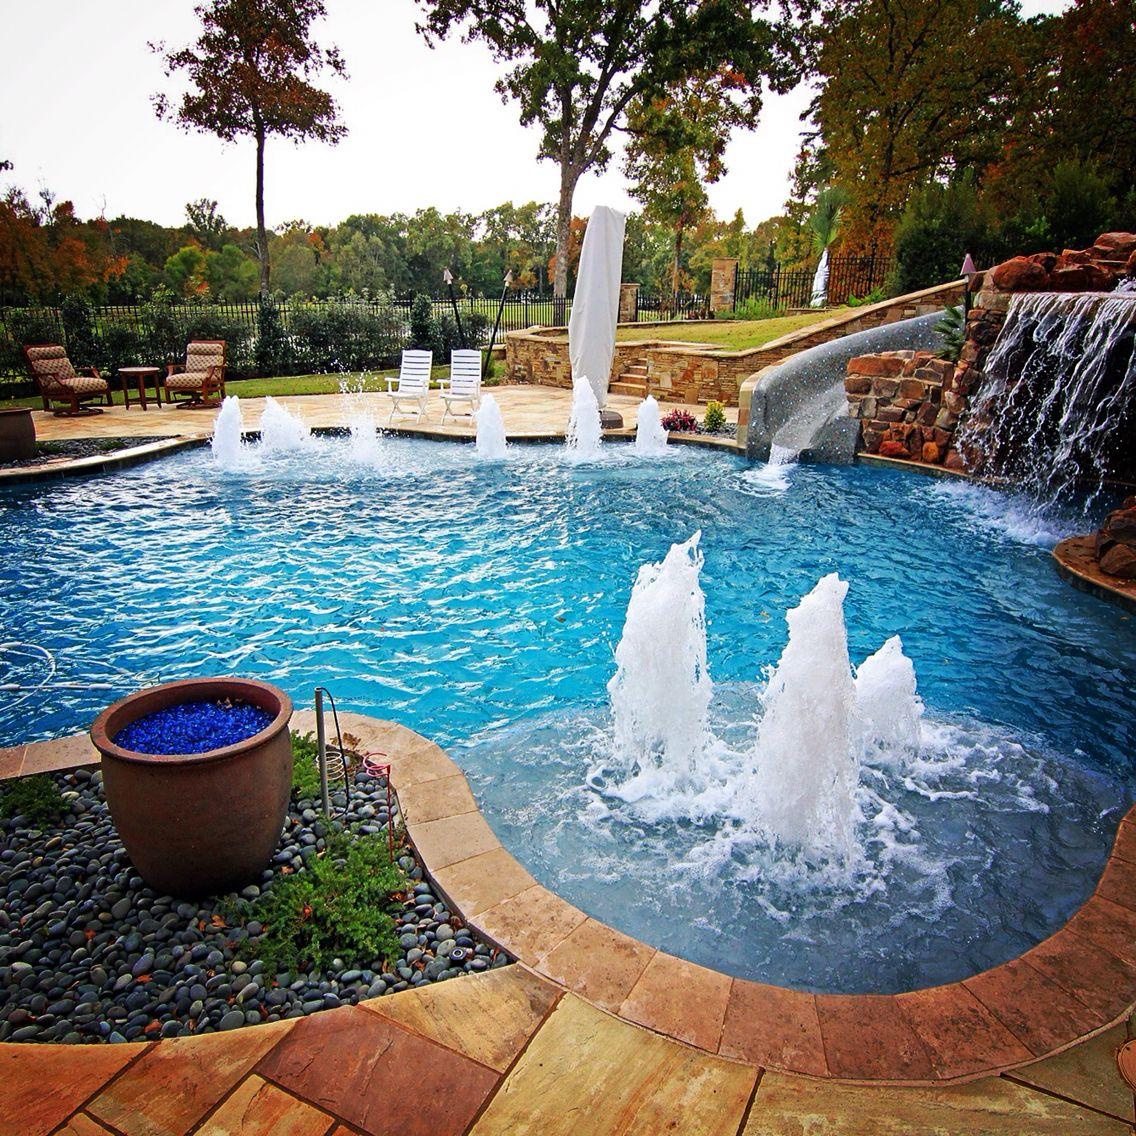 Amazing Awarding Winning Pool Designs That Will Blow You